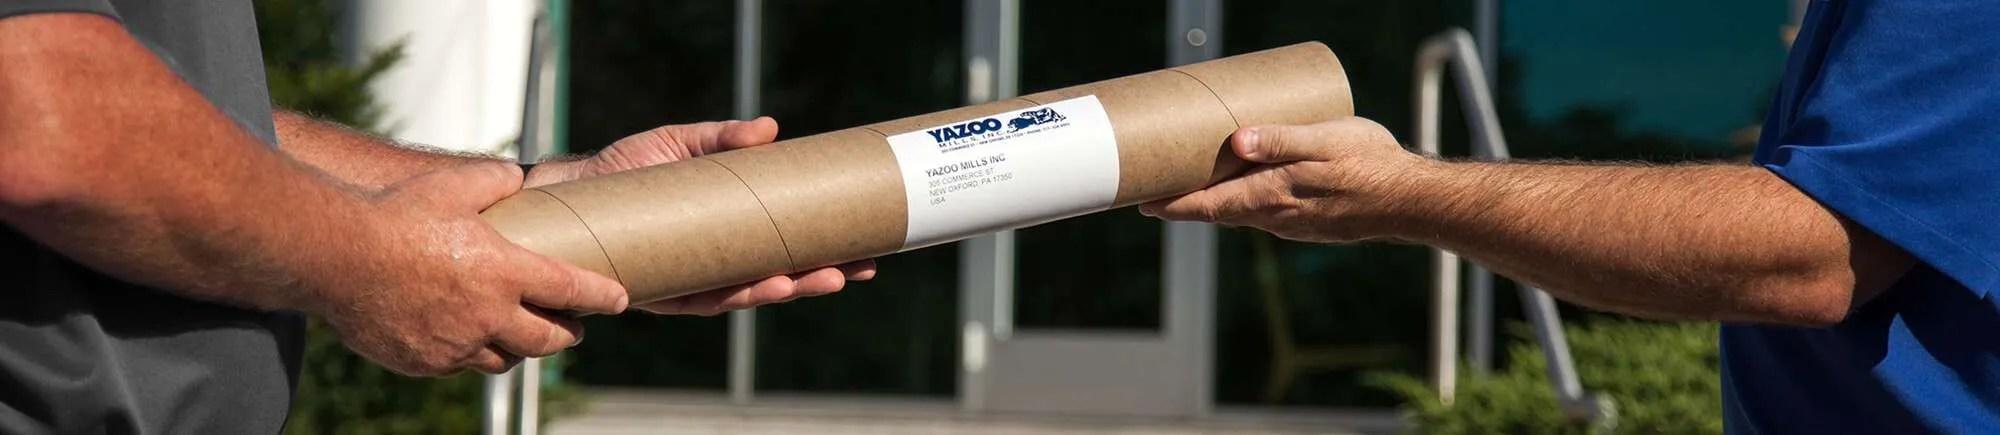 mailing tubes yazoomills